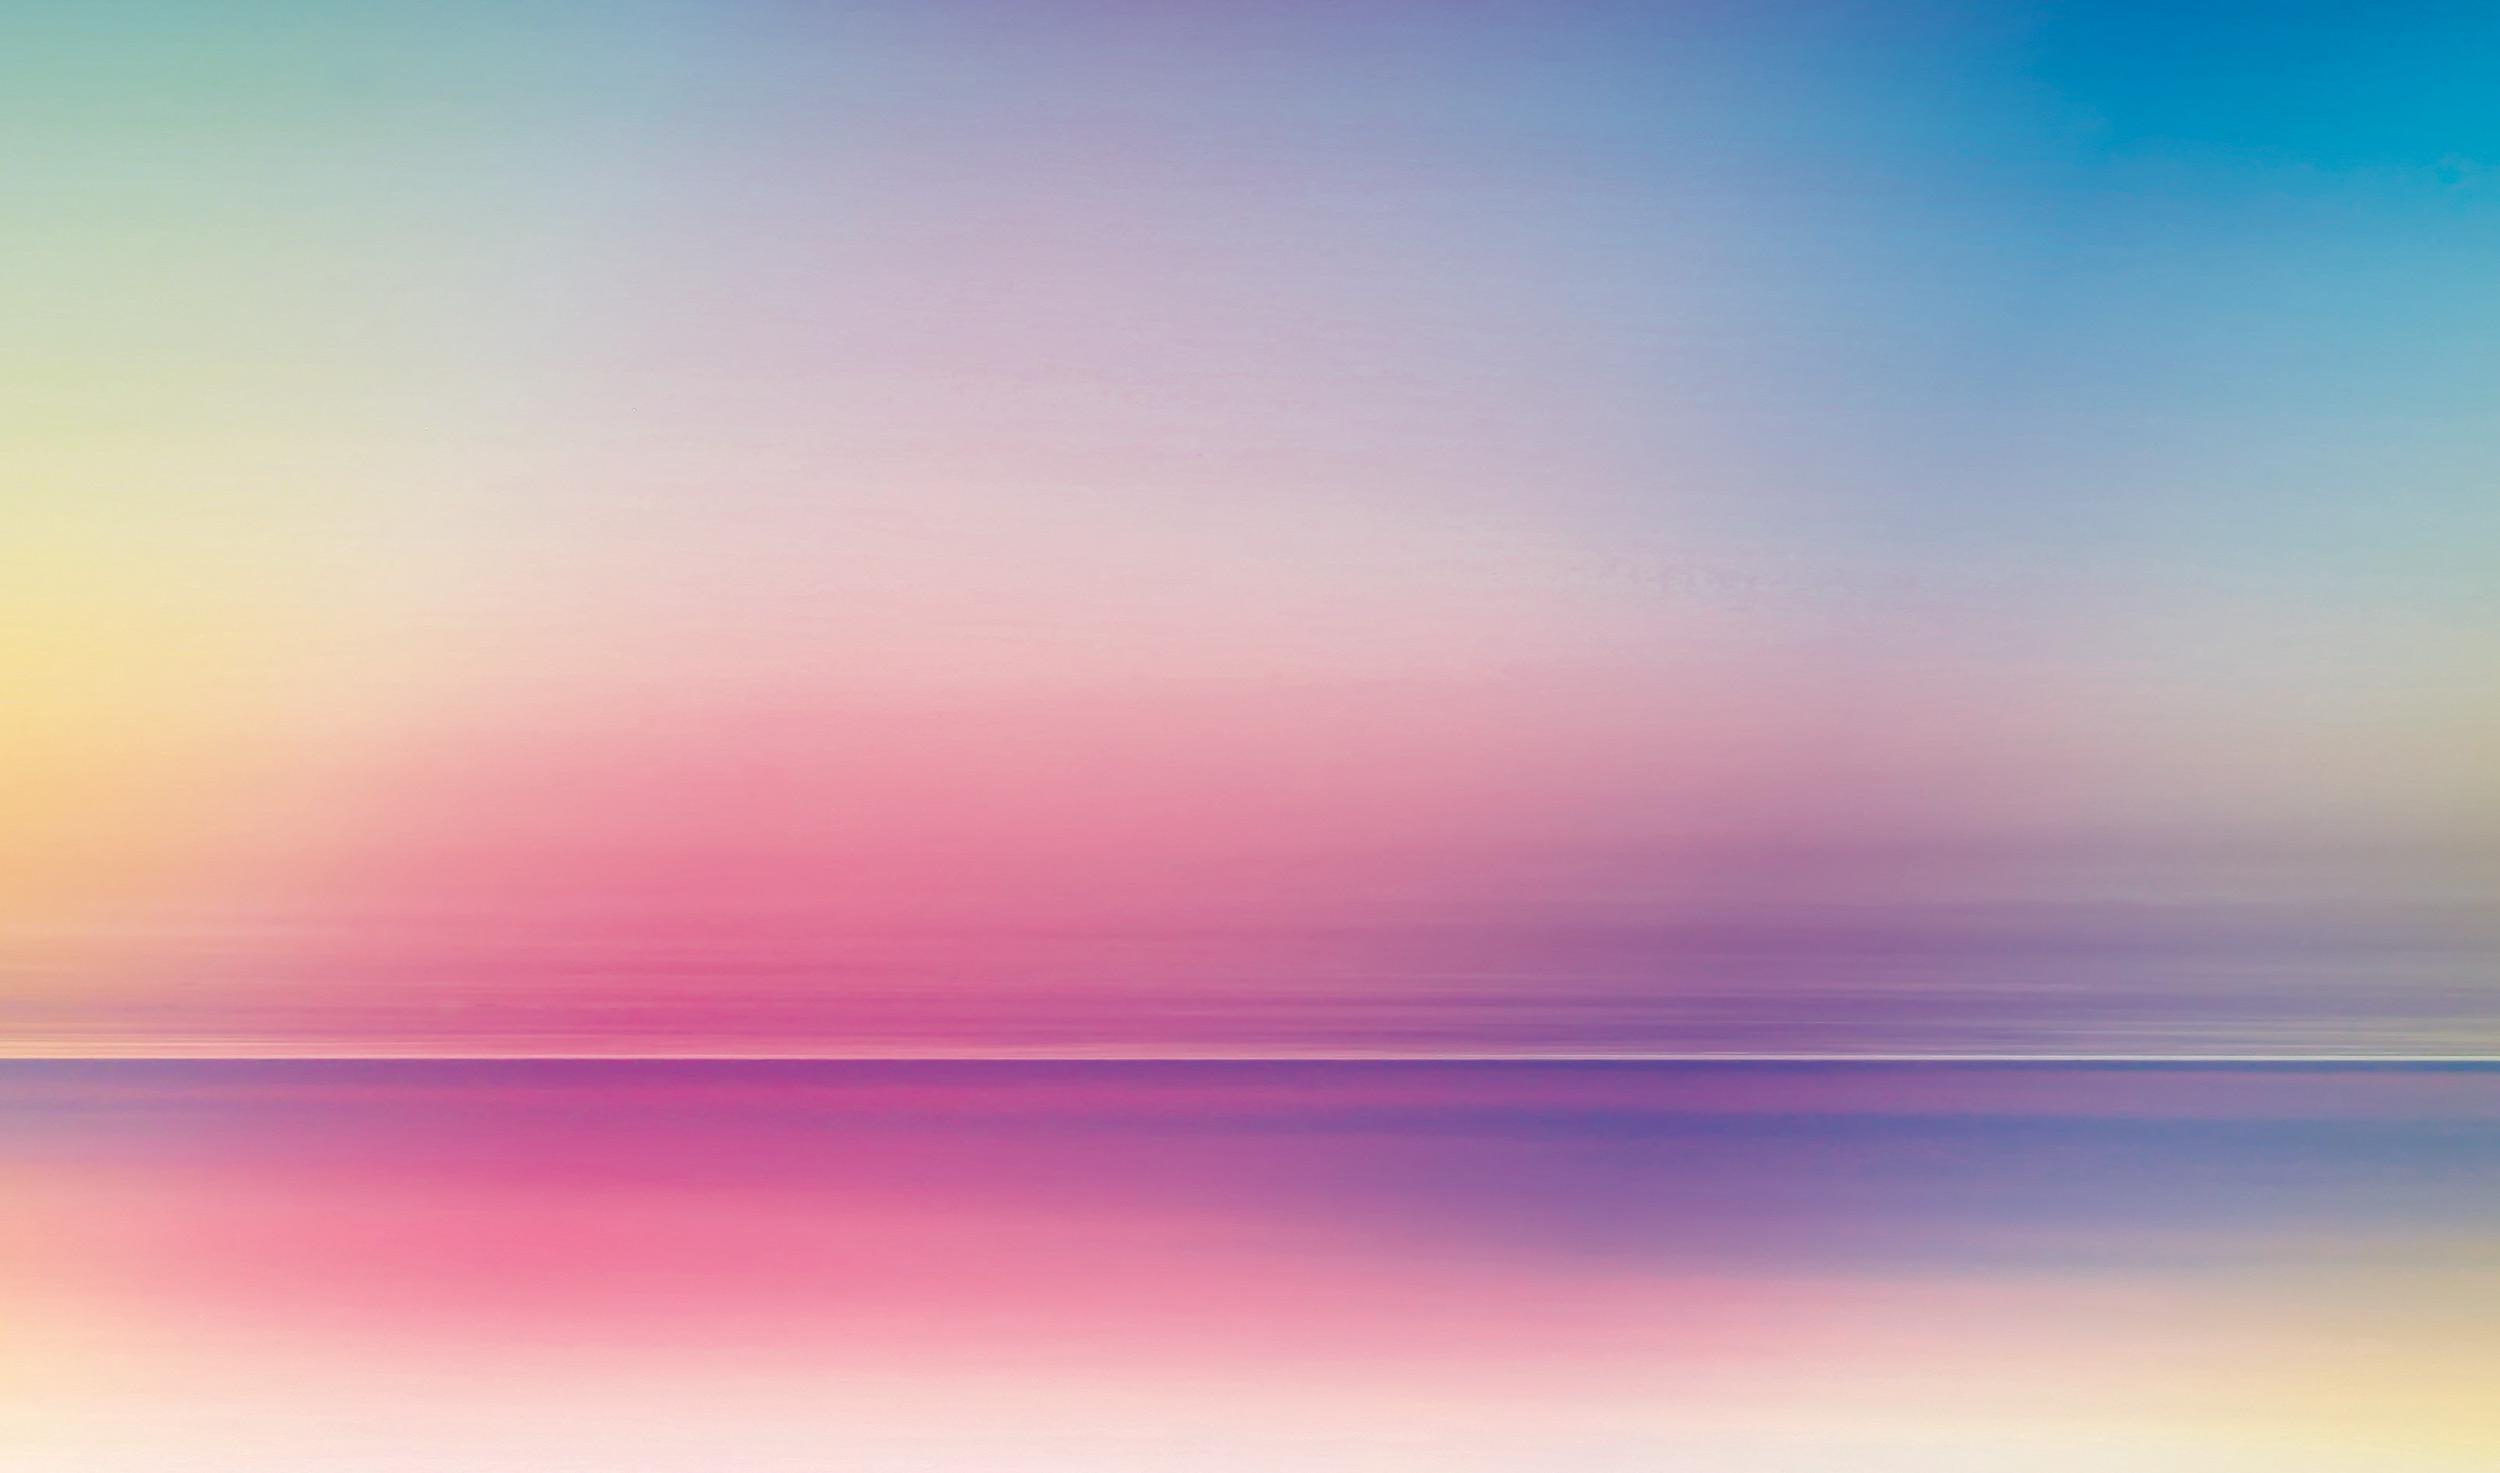 dankelab_Rainbow_04